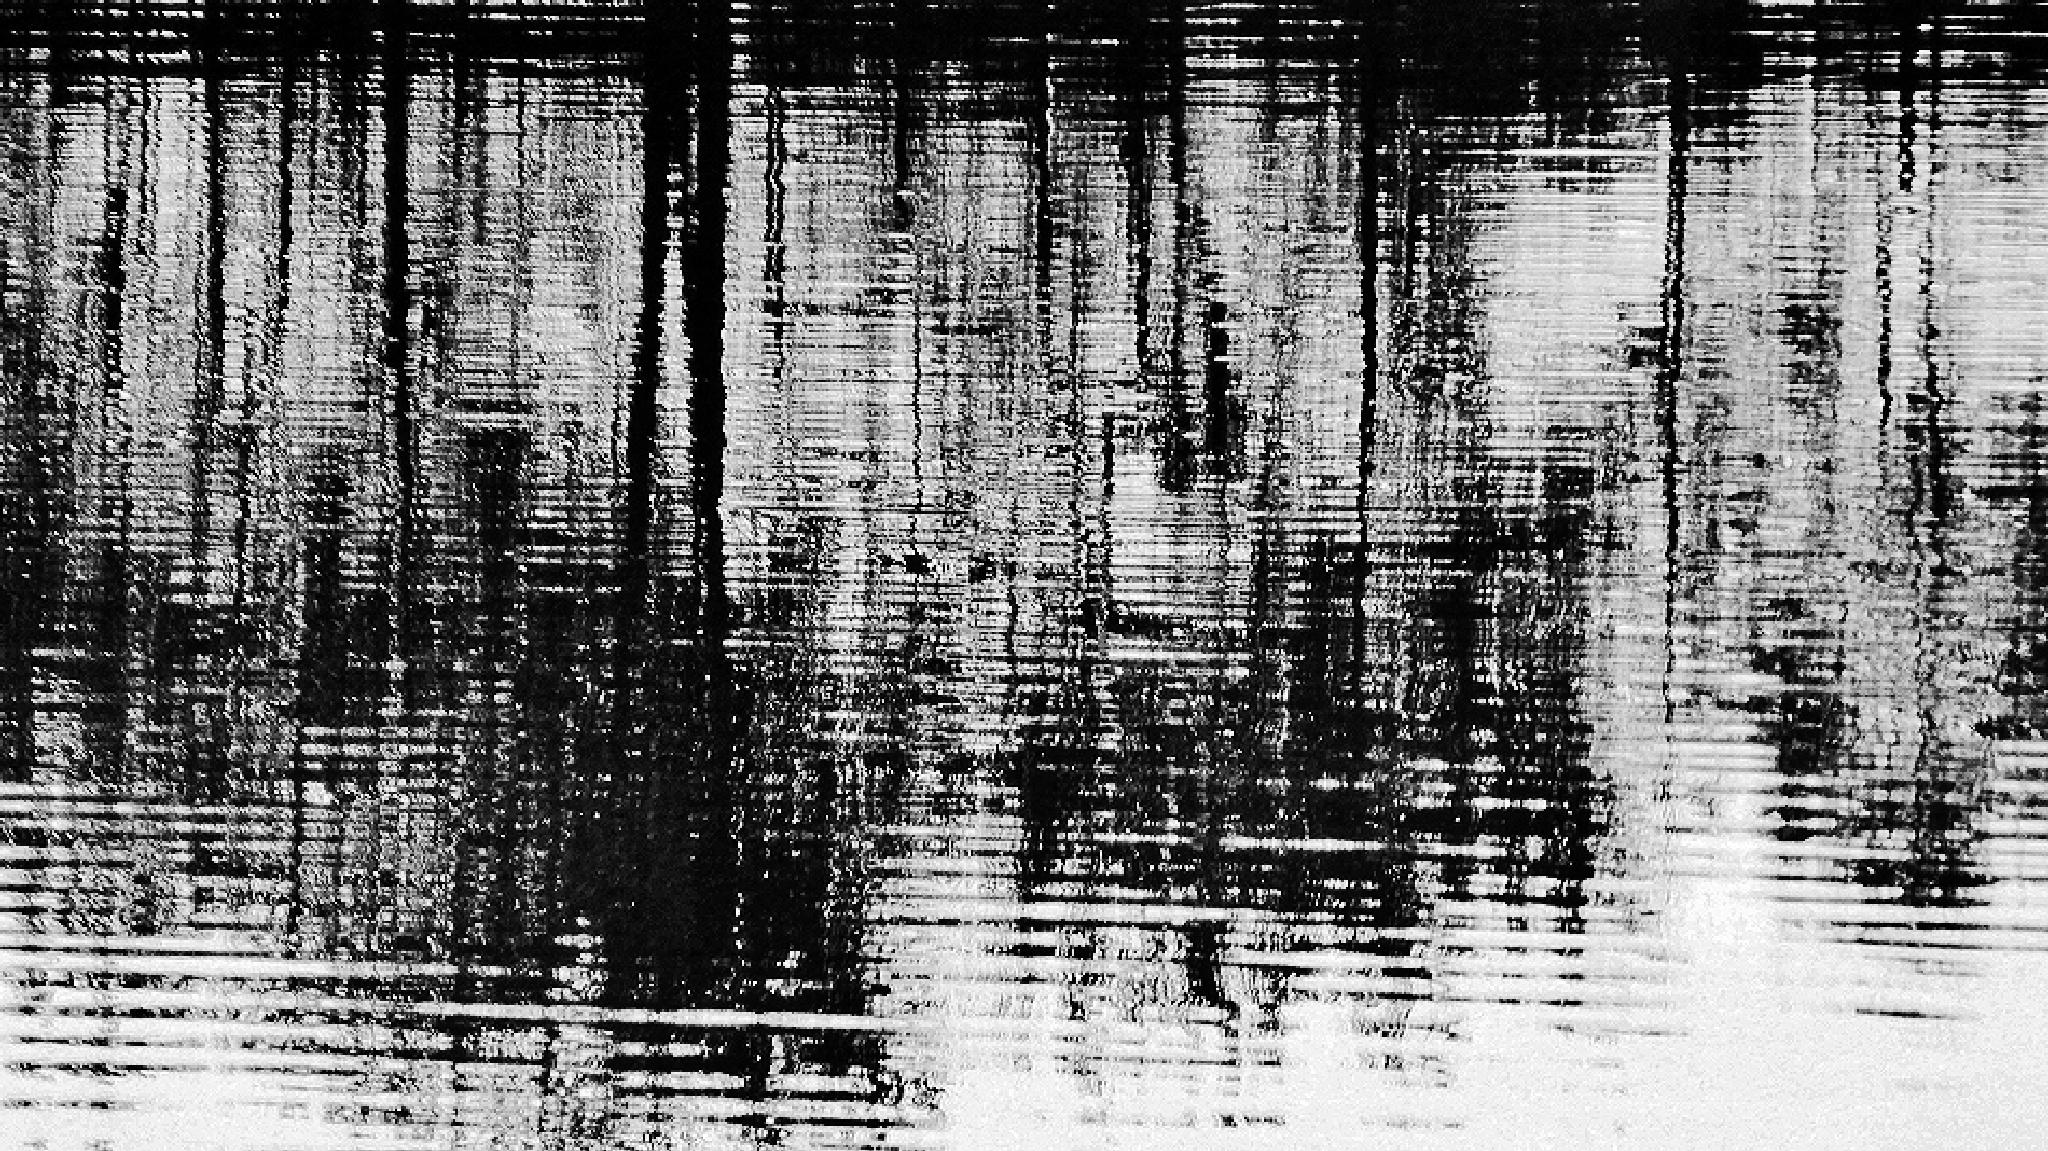 Reflection bw by Gernot Schwarz